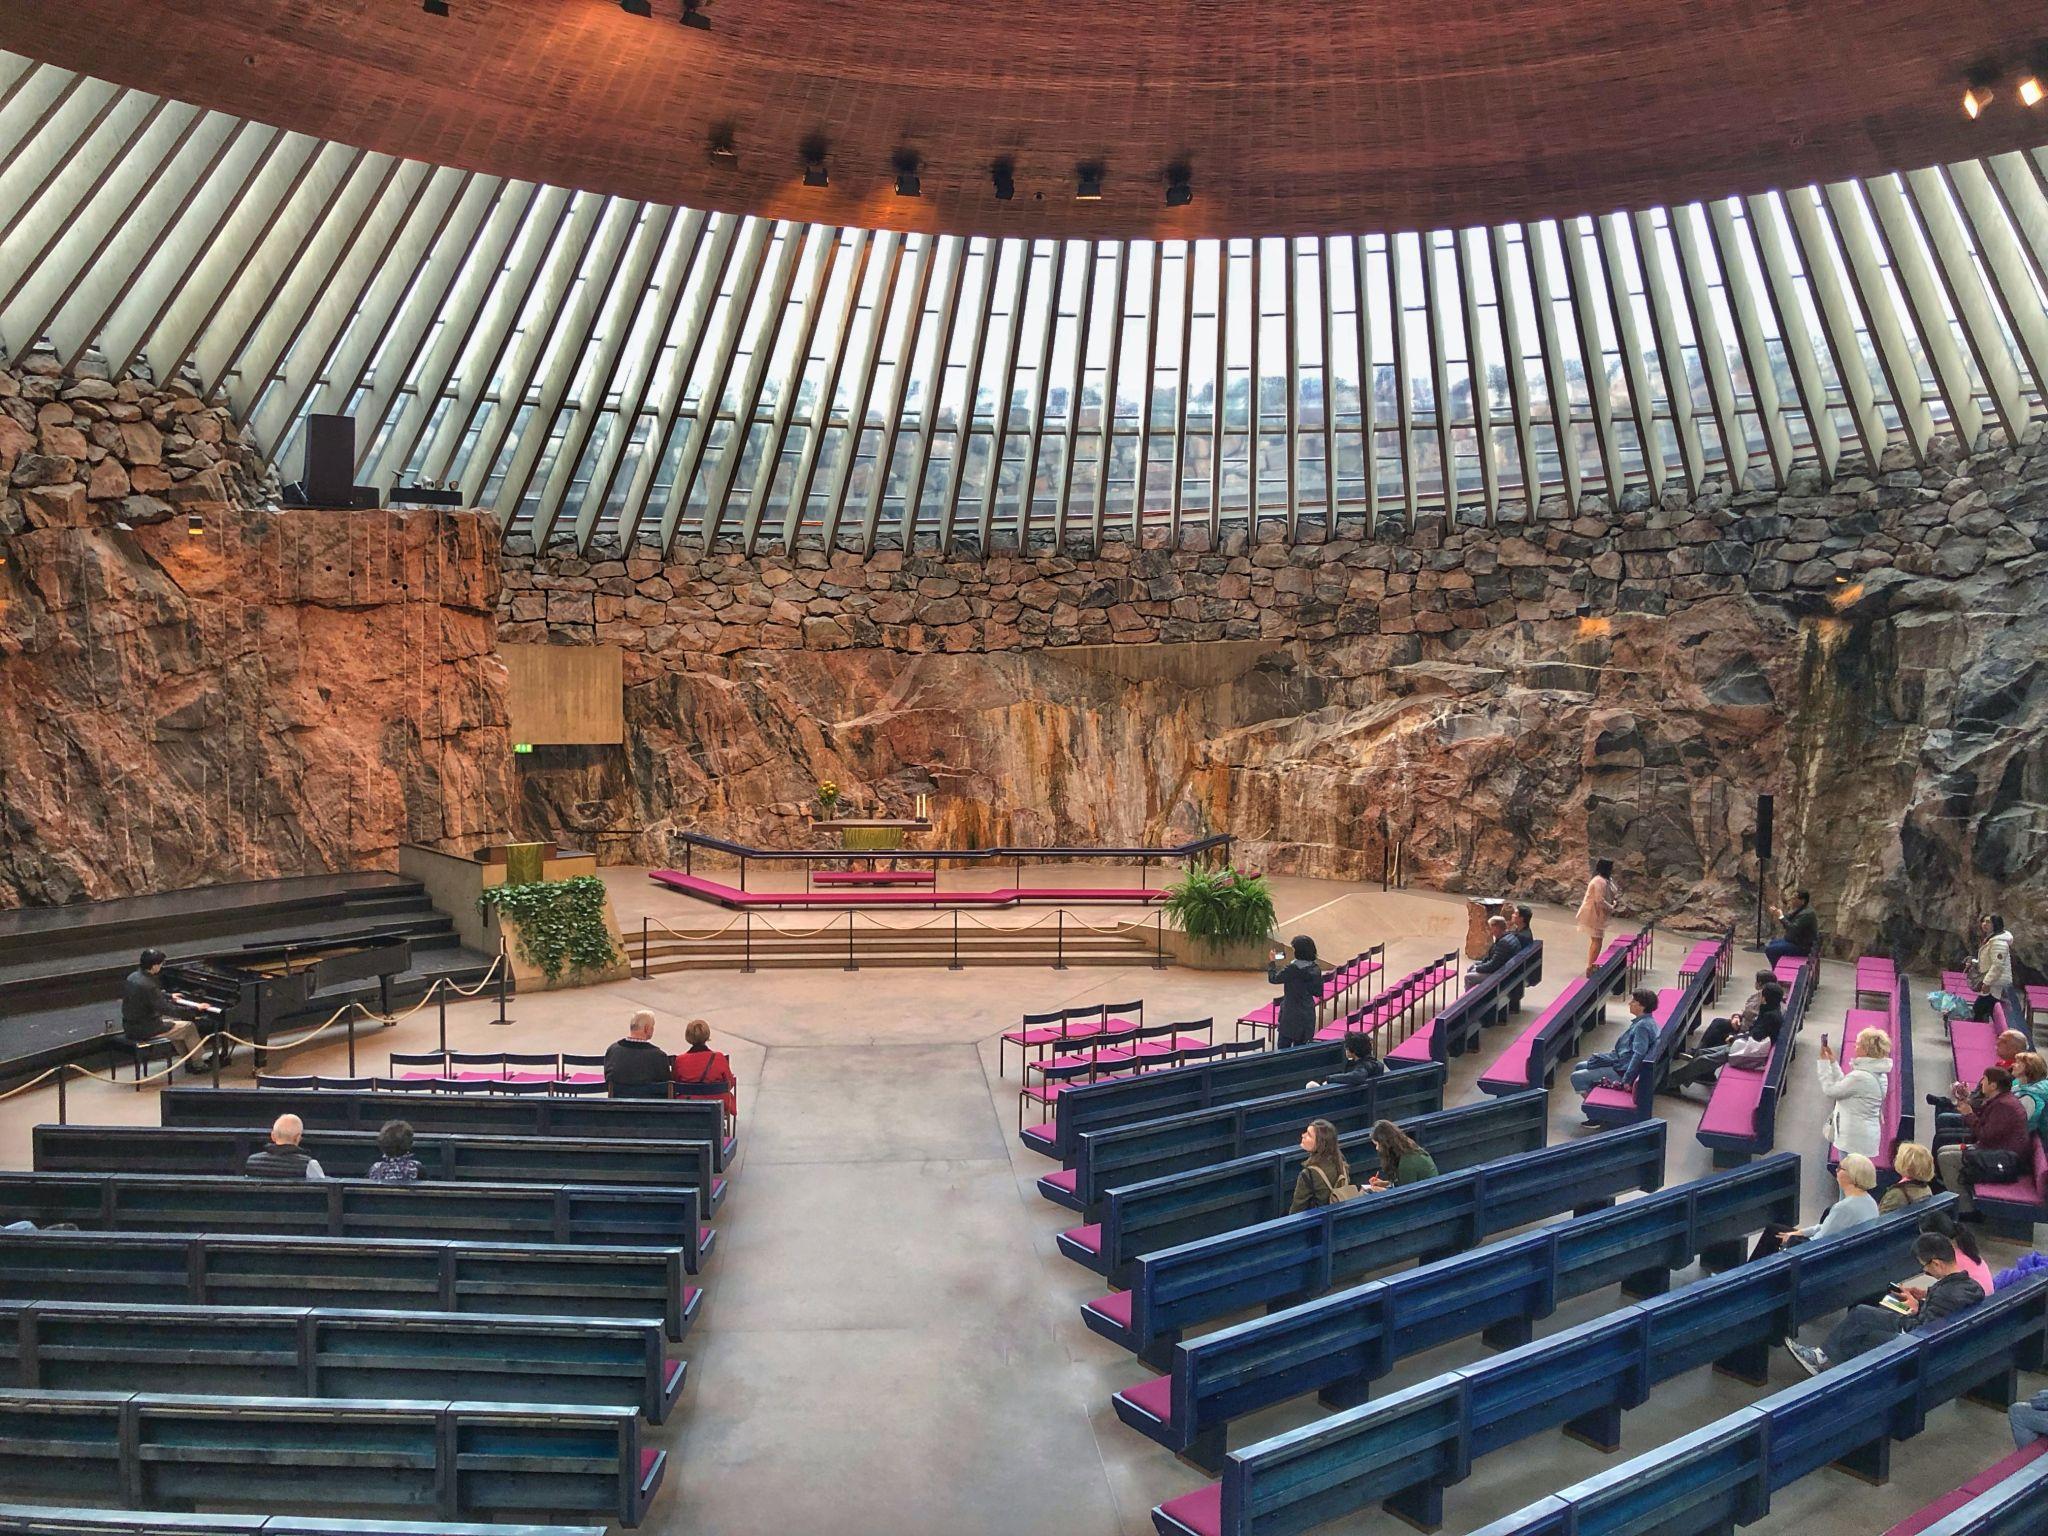 Temppeliaukio Rock Church, Finland